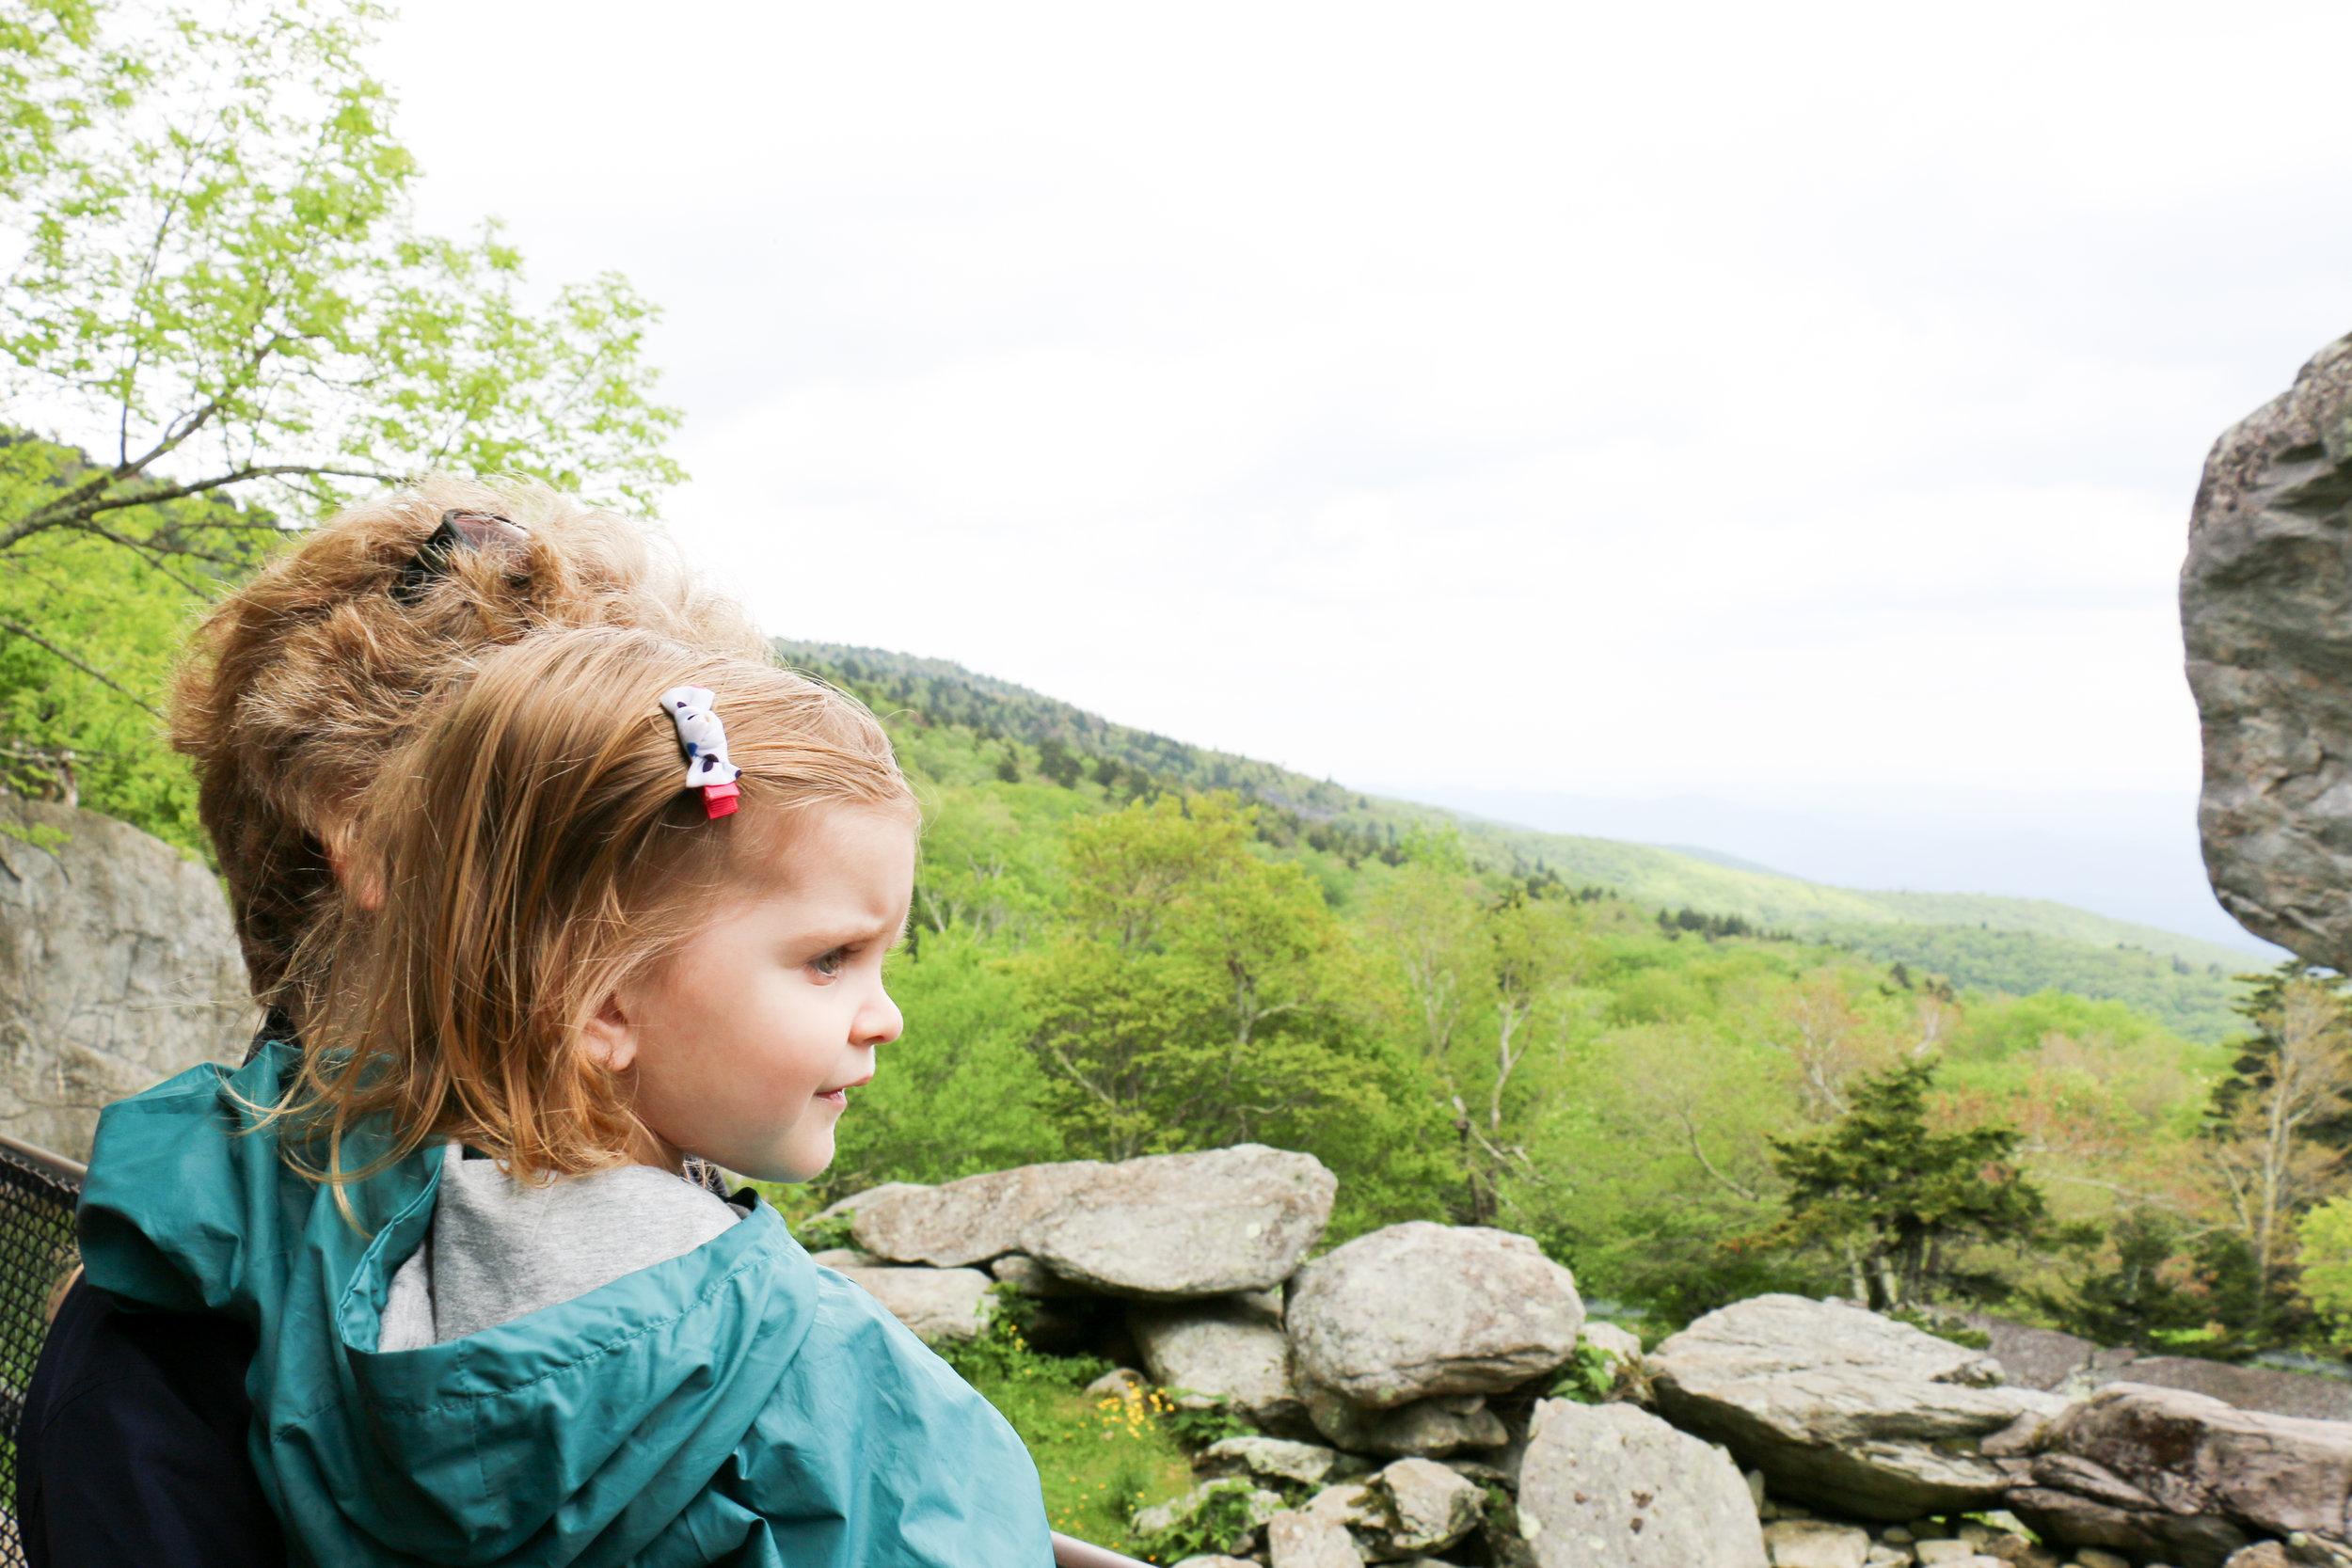 grandfather-mountain-wildlife-habitat-clm